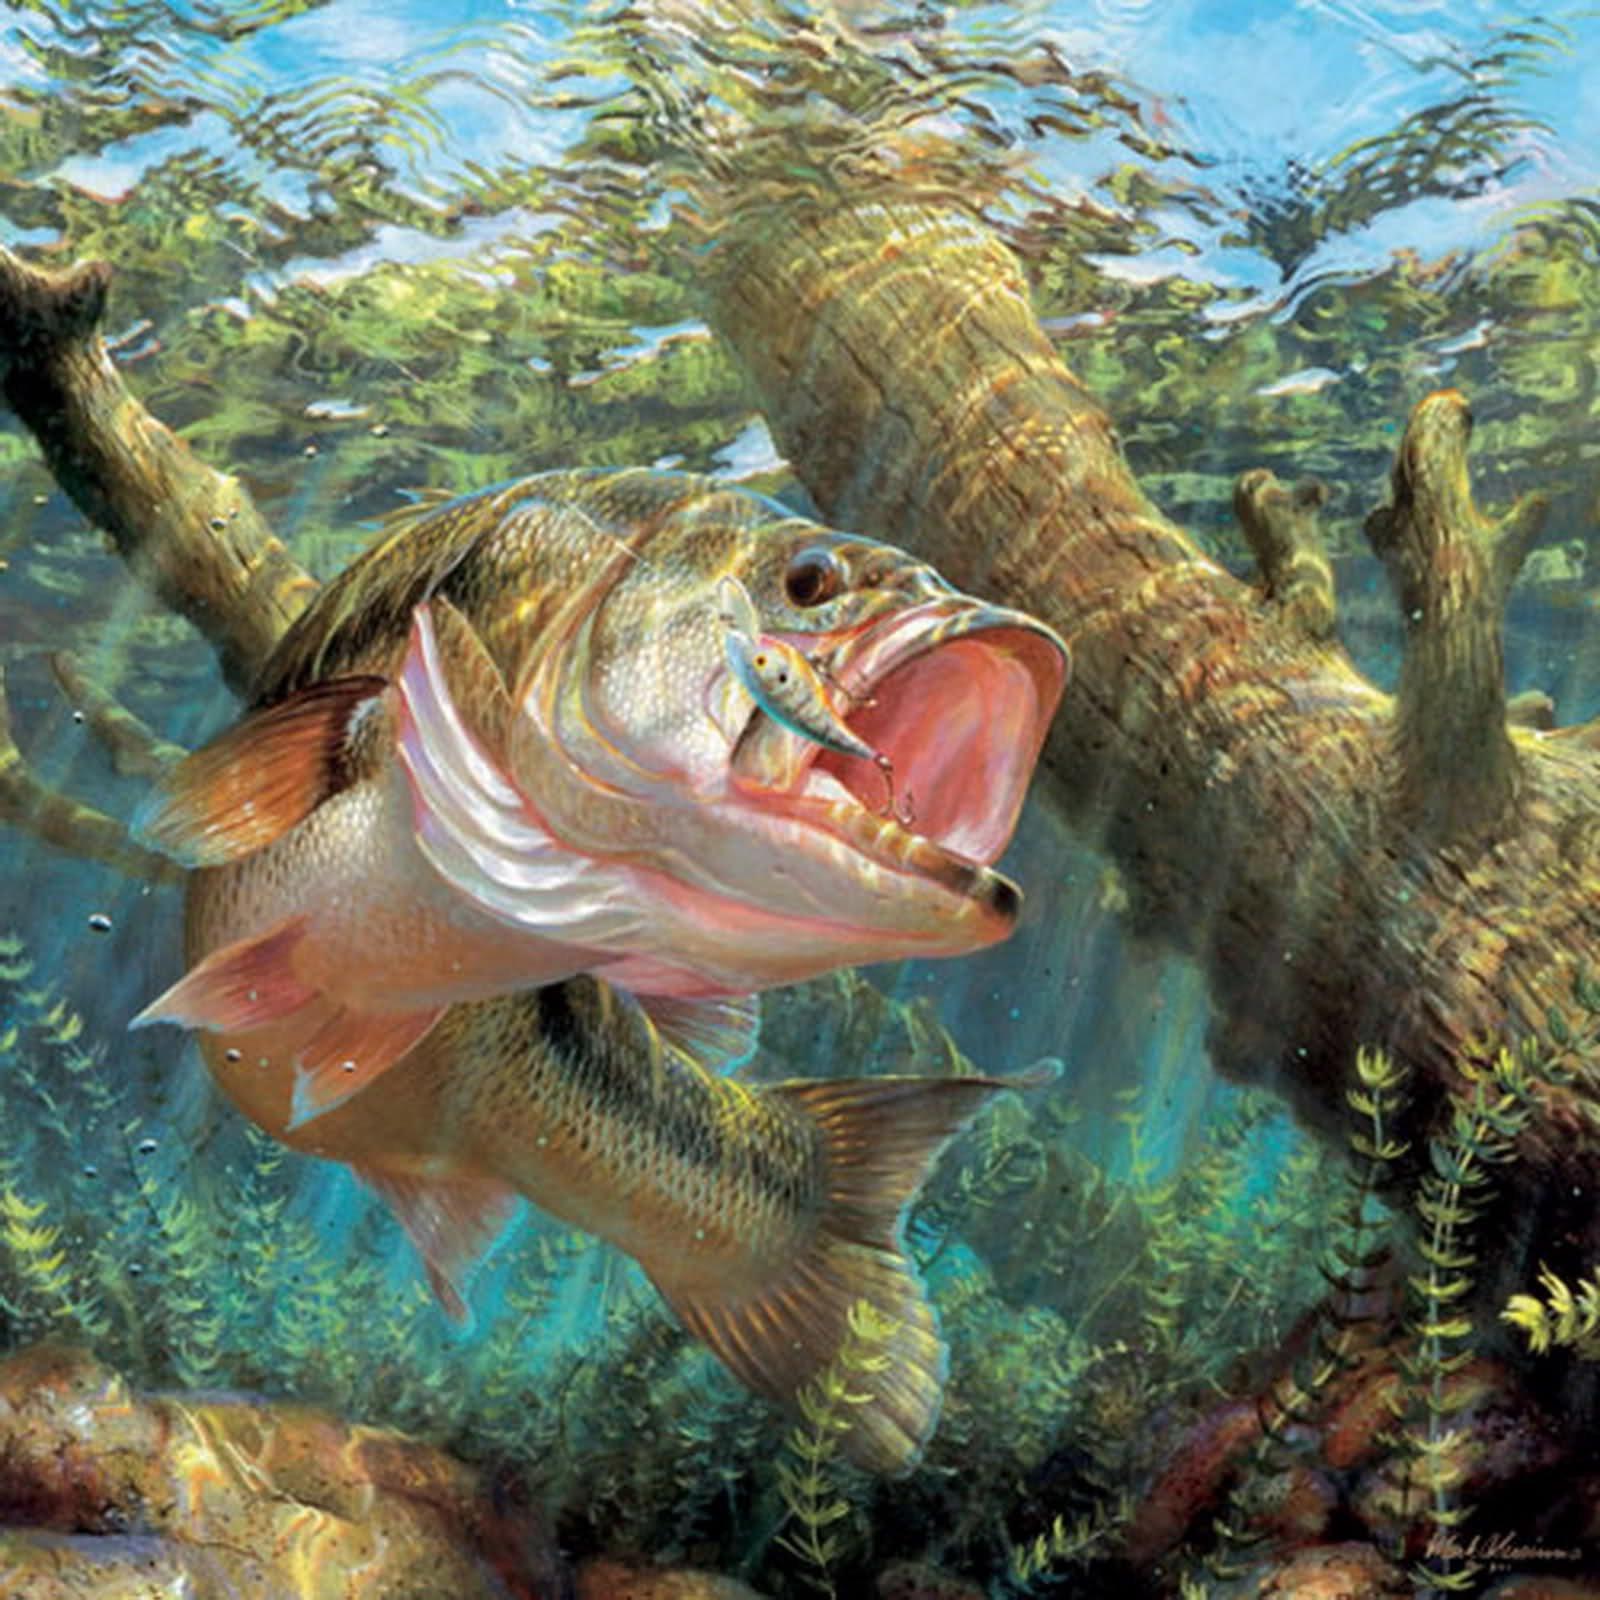 Free Download Bass Fishing Wallpaper Backgrounds Bass Wallpaper Background 1600x1600 For Your Desktop Mobile Tablet Explore 49 Bass Fishing Wallpaper Fishing Wallpaper Hd